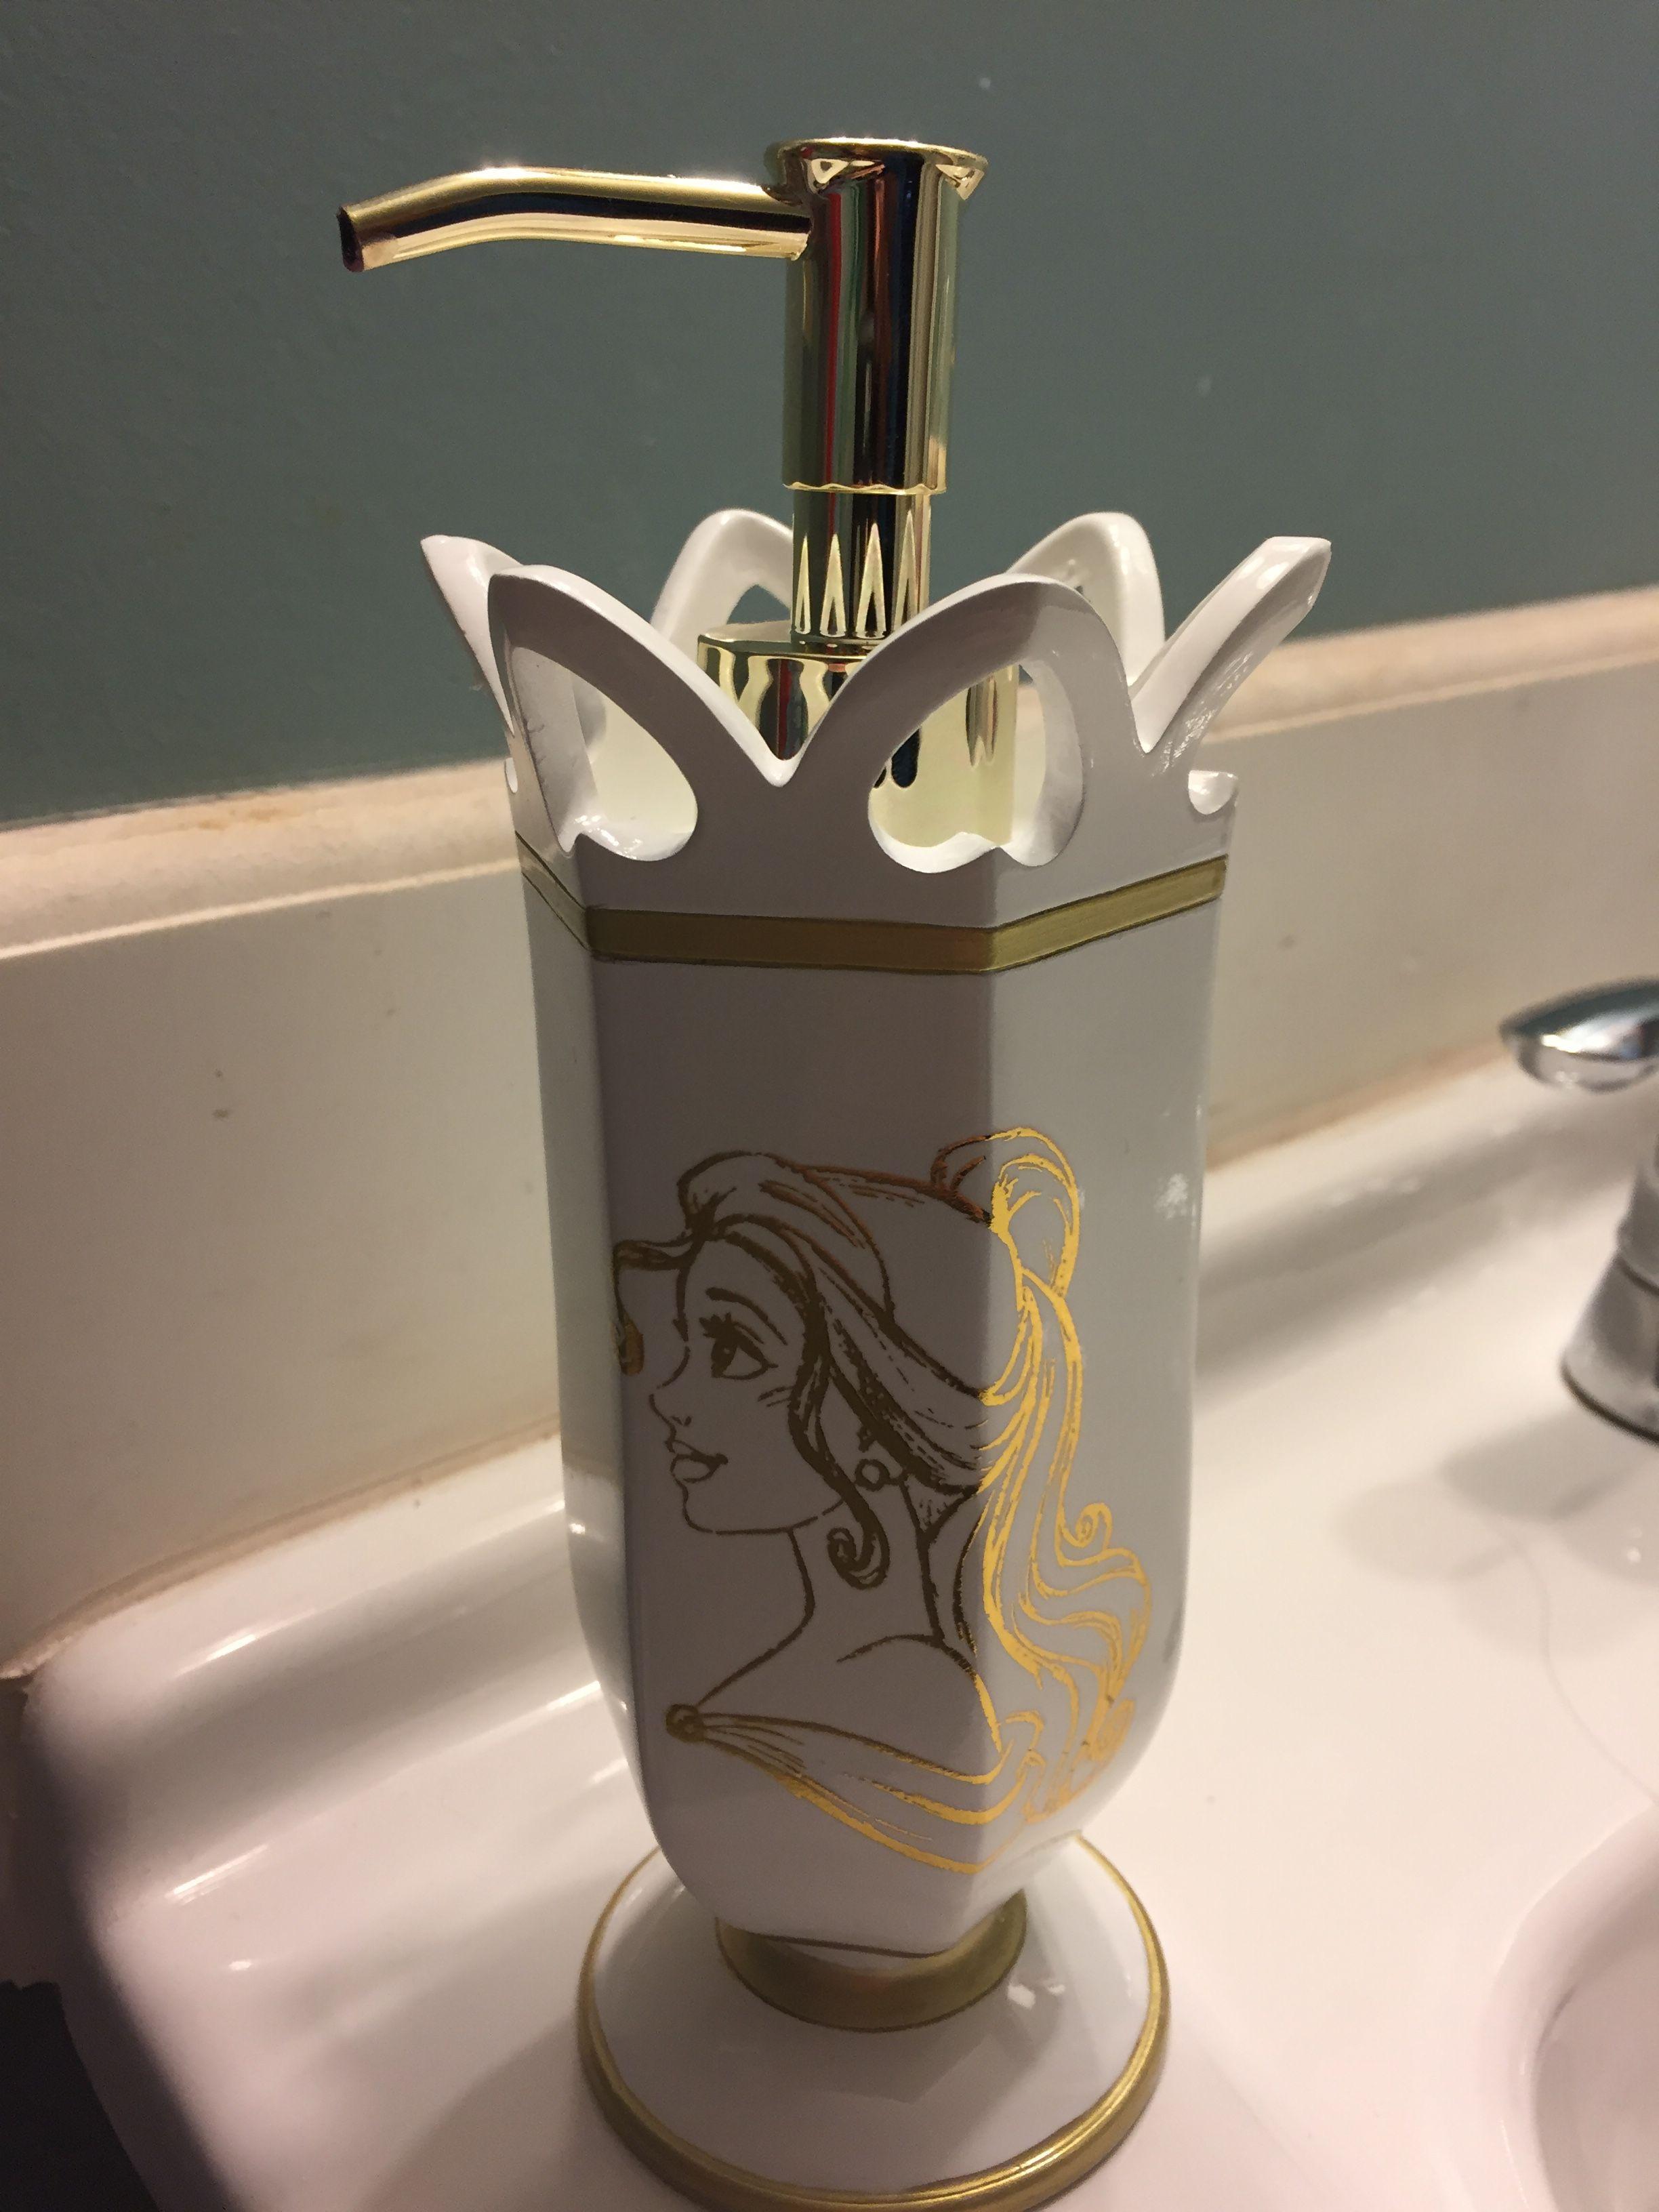 Beauty And The Beast Bathroom